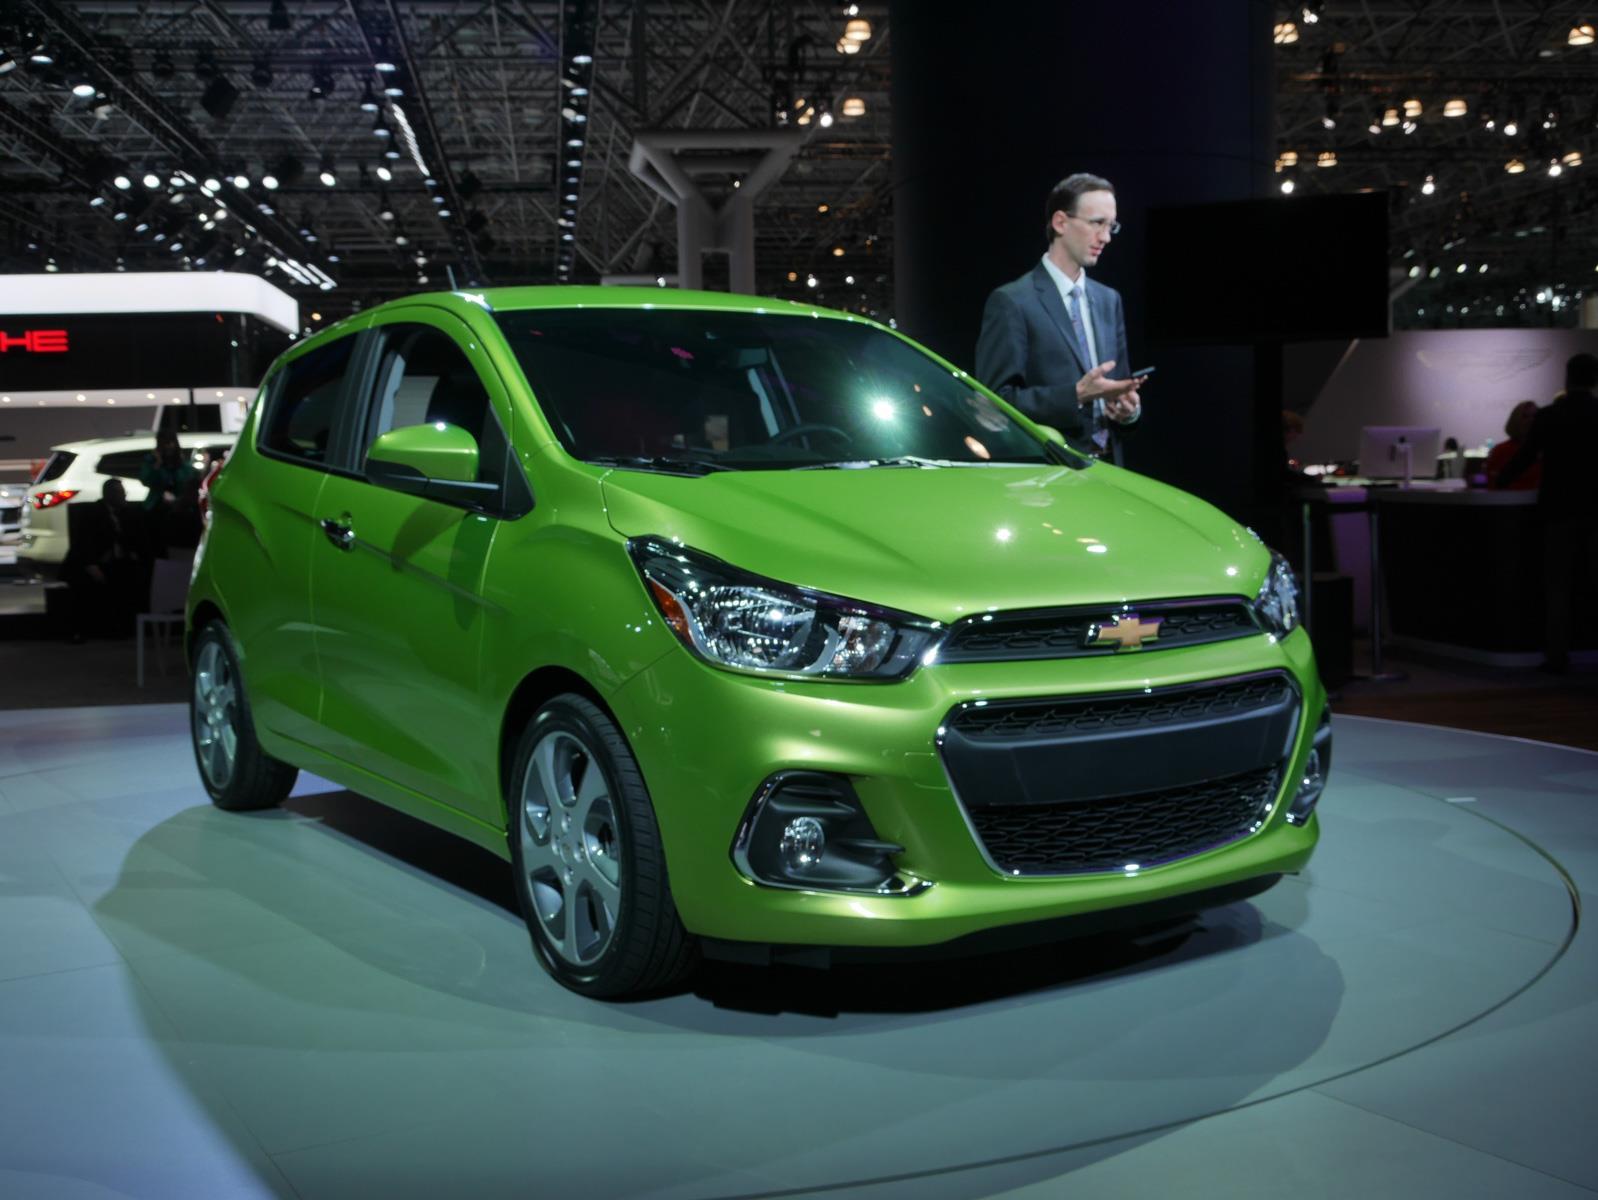 Auto Show de Nueva York 2015 - Chevrolet Spark 2016 ...